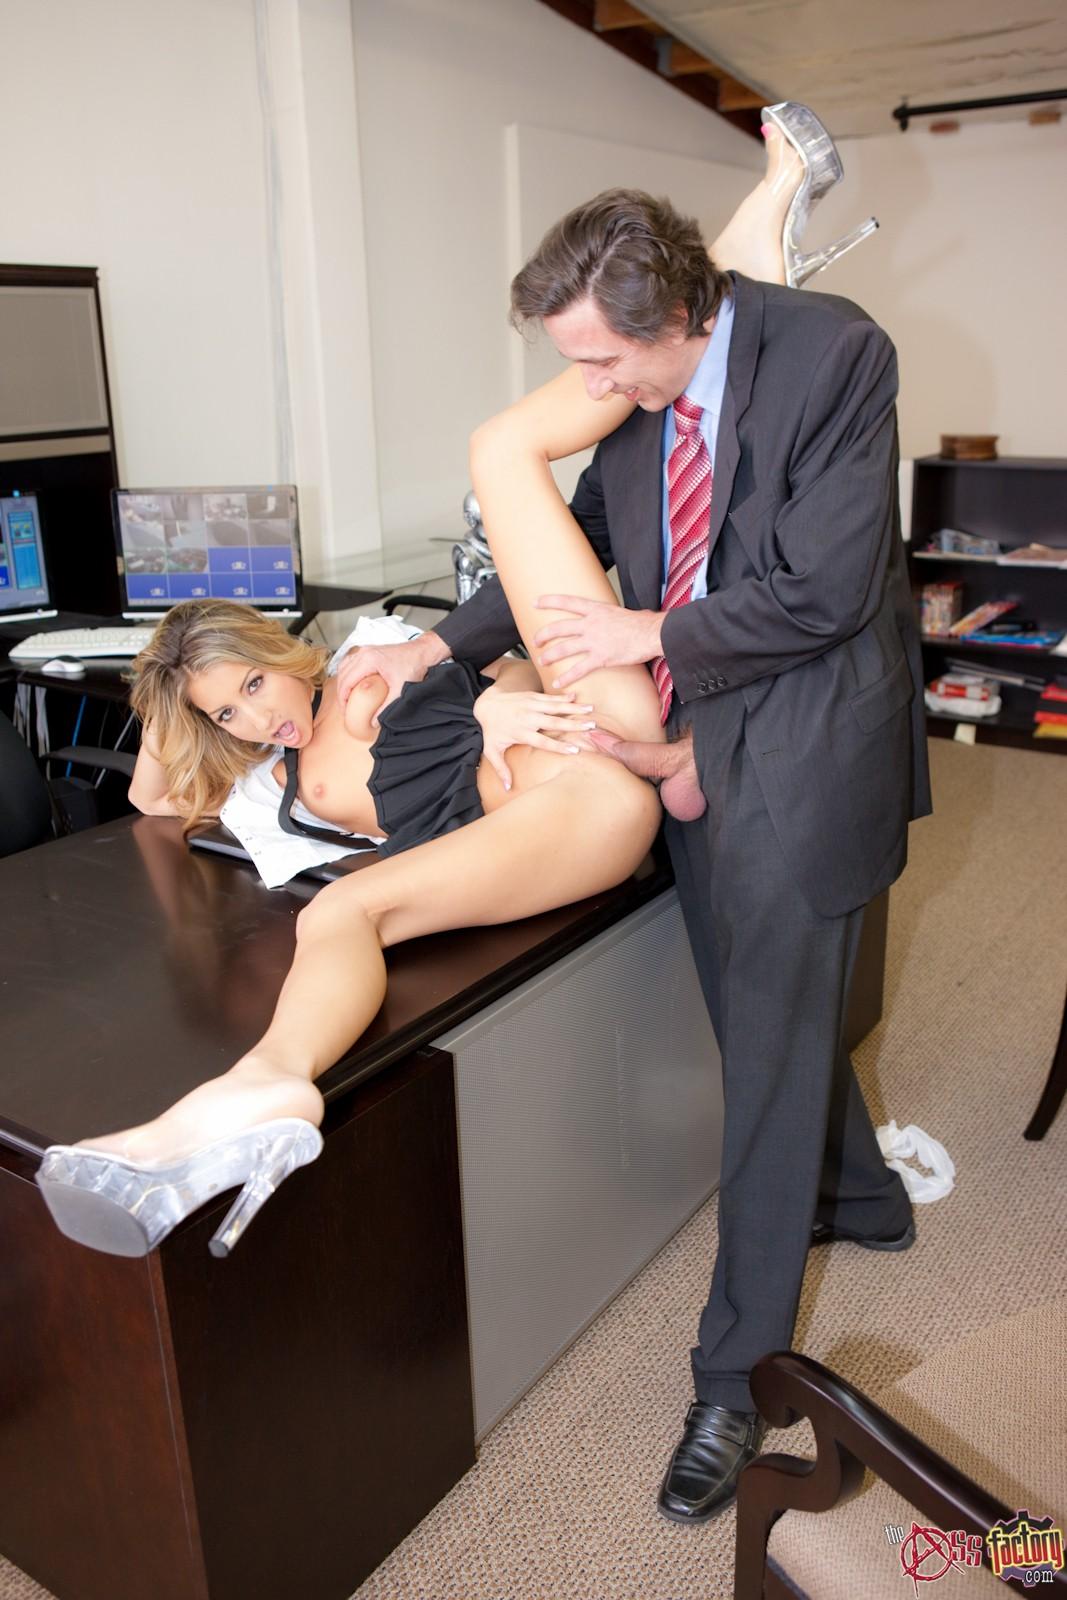 босс задирает юбку секретарше женой